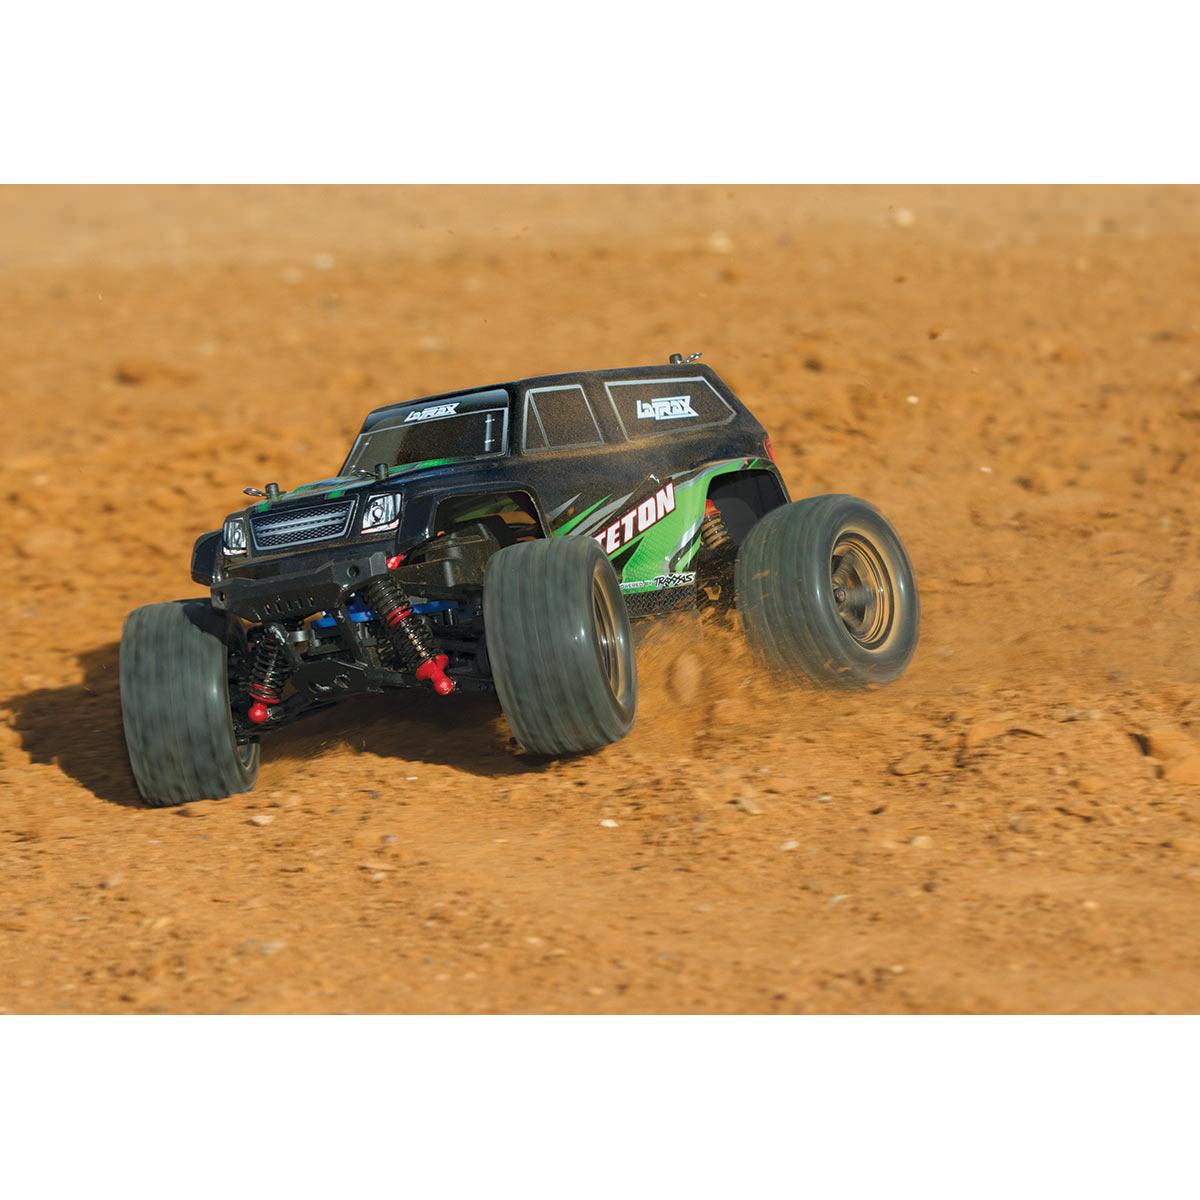 Traxxas 76054 Latrax Teton Green Rc Monster Truck At Hobby